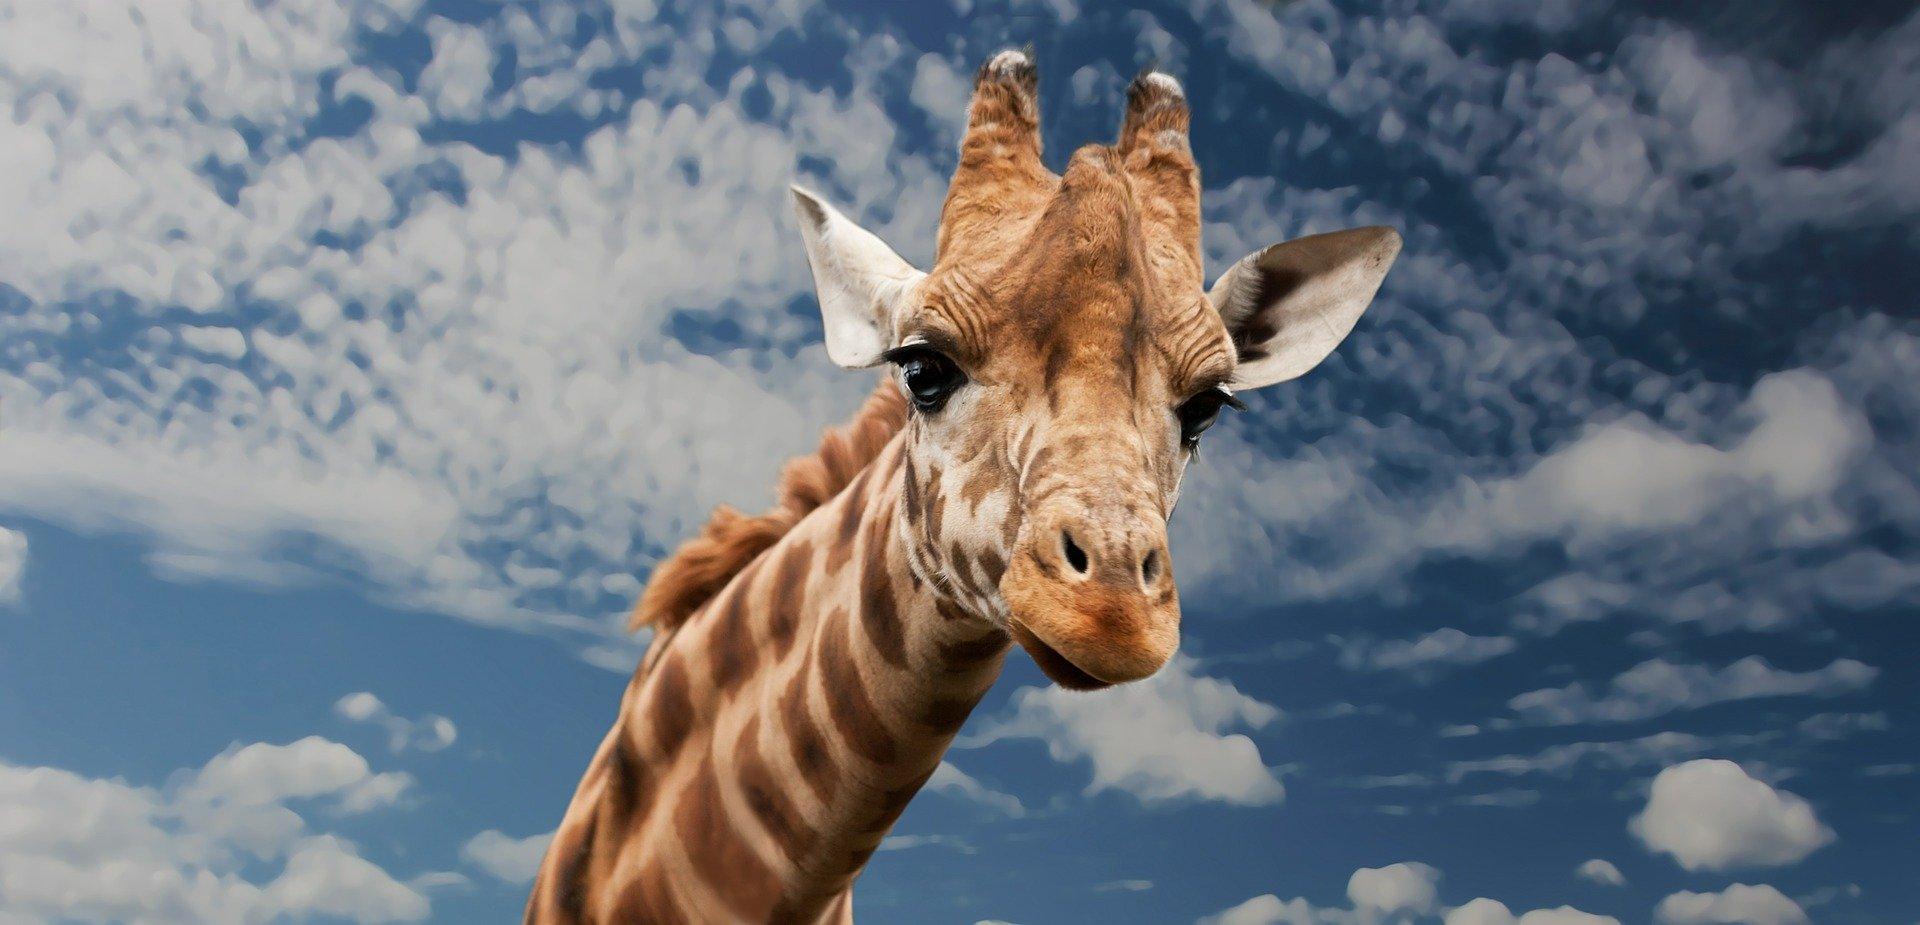 Shoppers call out major gaffe on Waitrose's Gerry The Giraffe cake